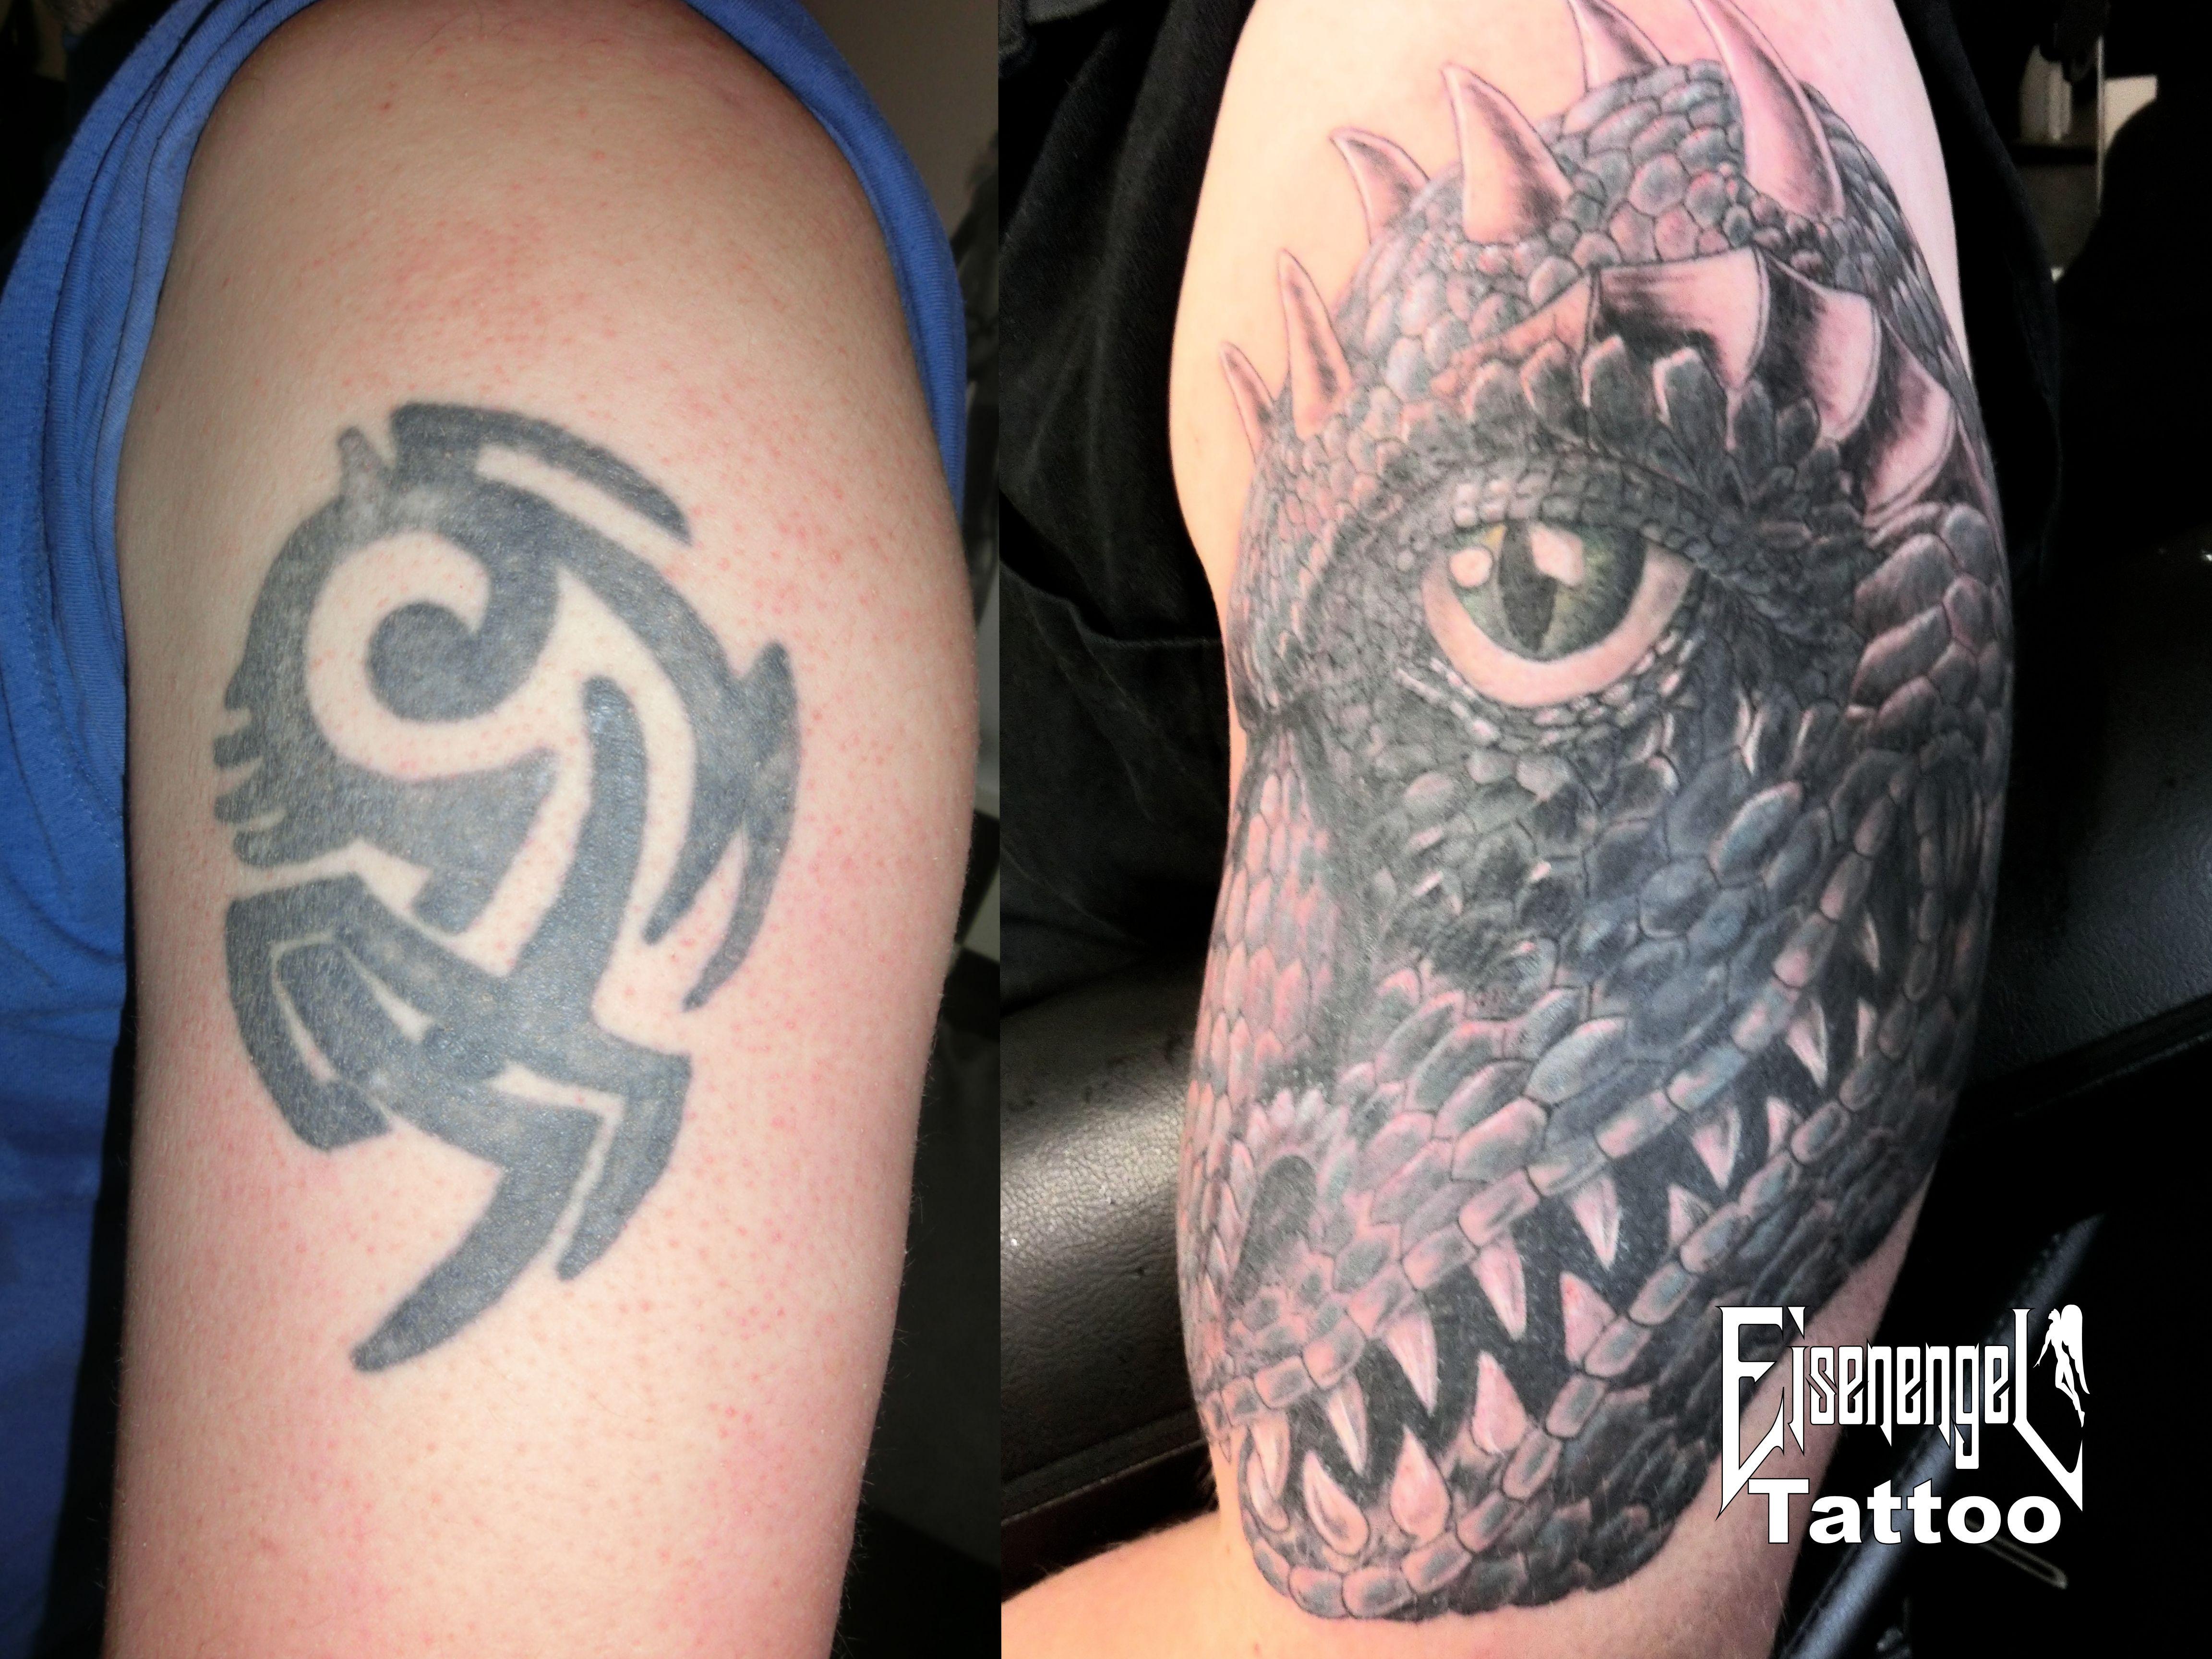 tattoo_coverup_drache_4.jpg